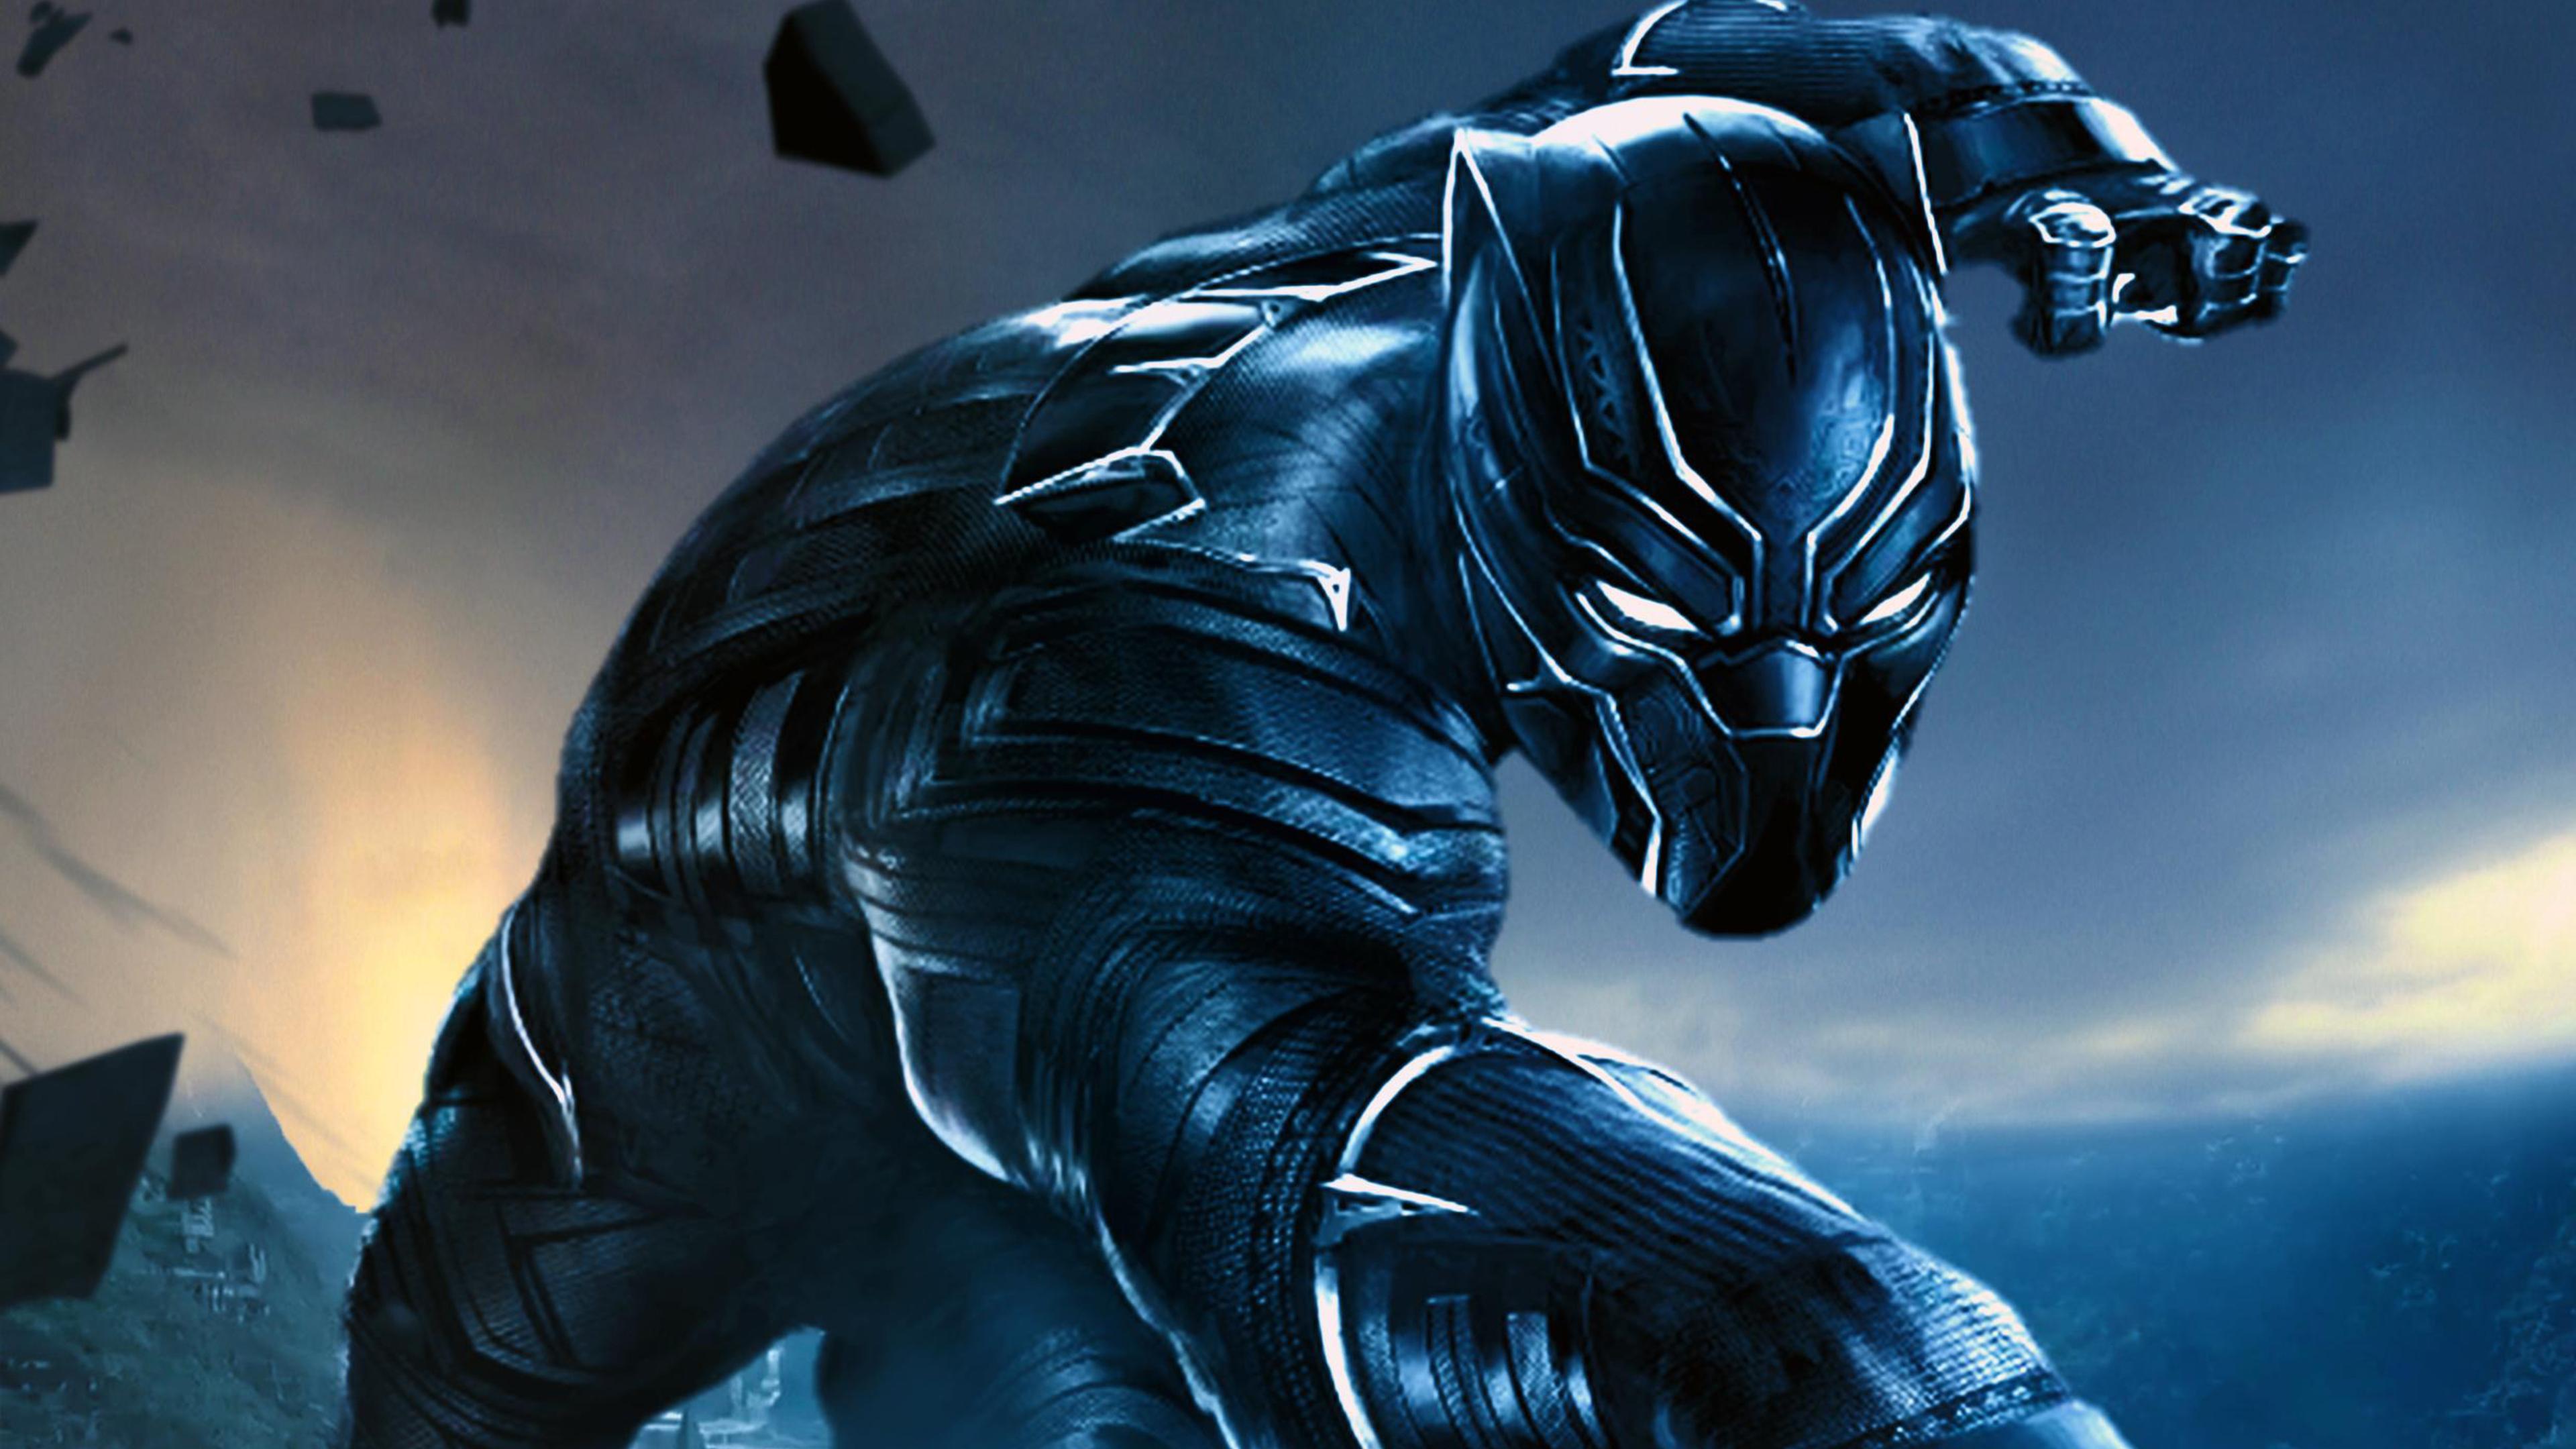 3840x2160 Black Panther Fan Made 4k HD 4k Wallpapers ...